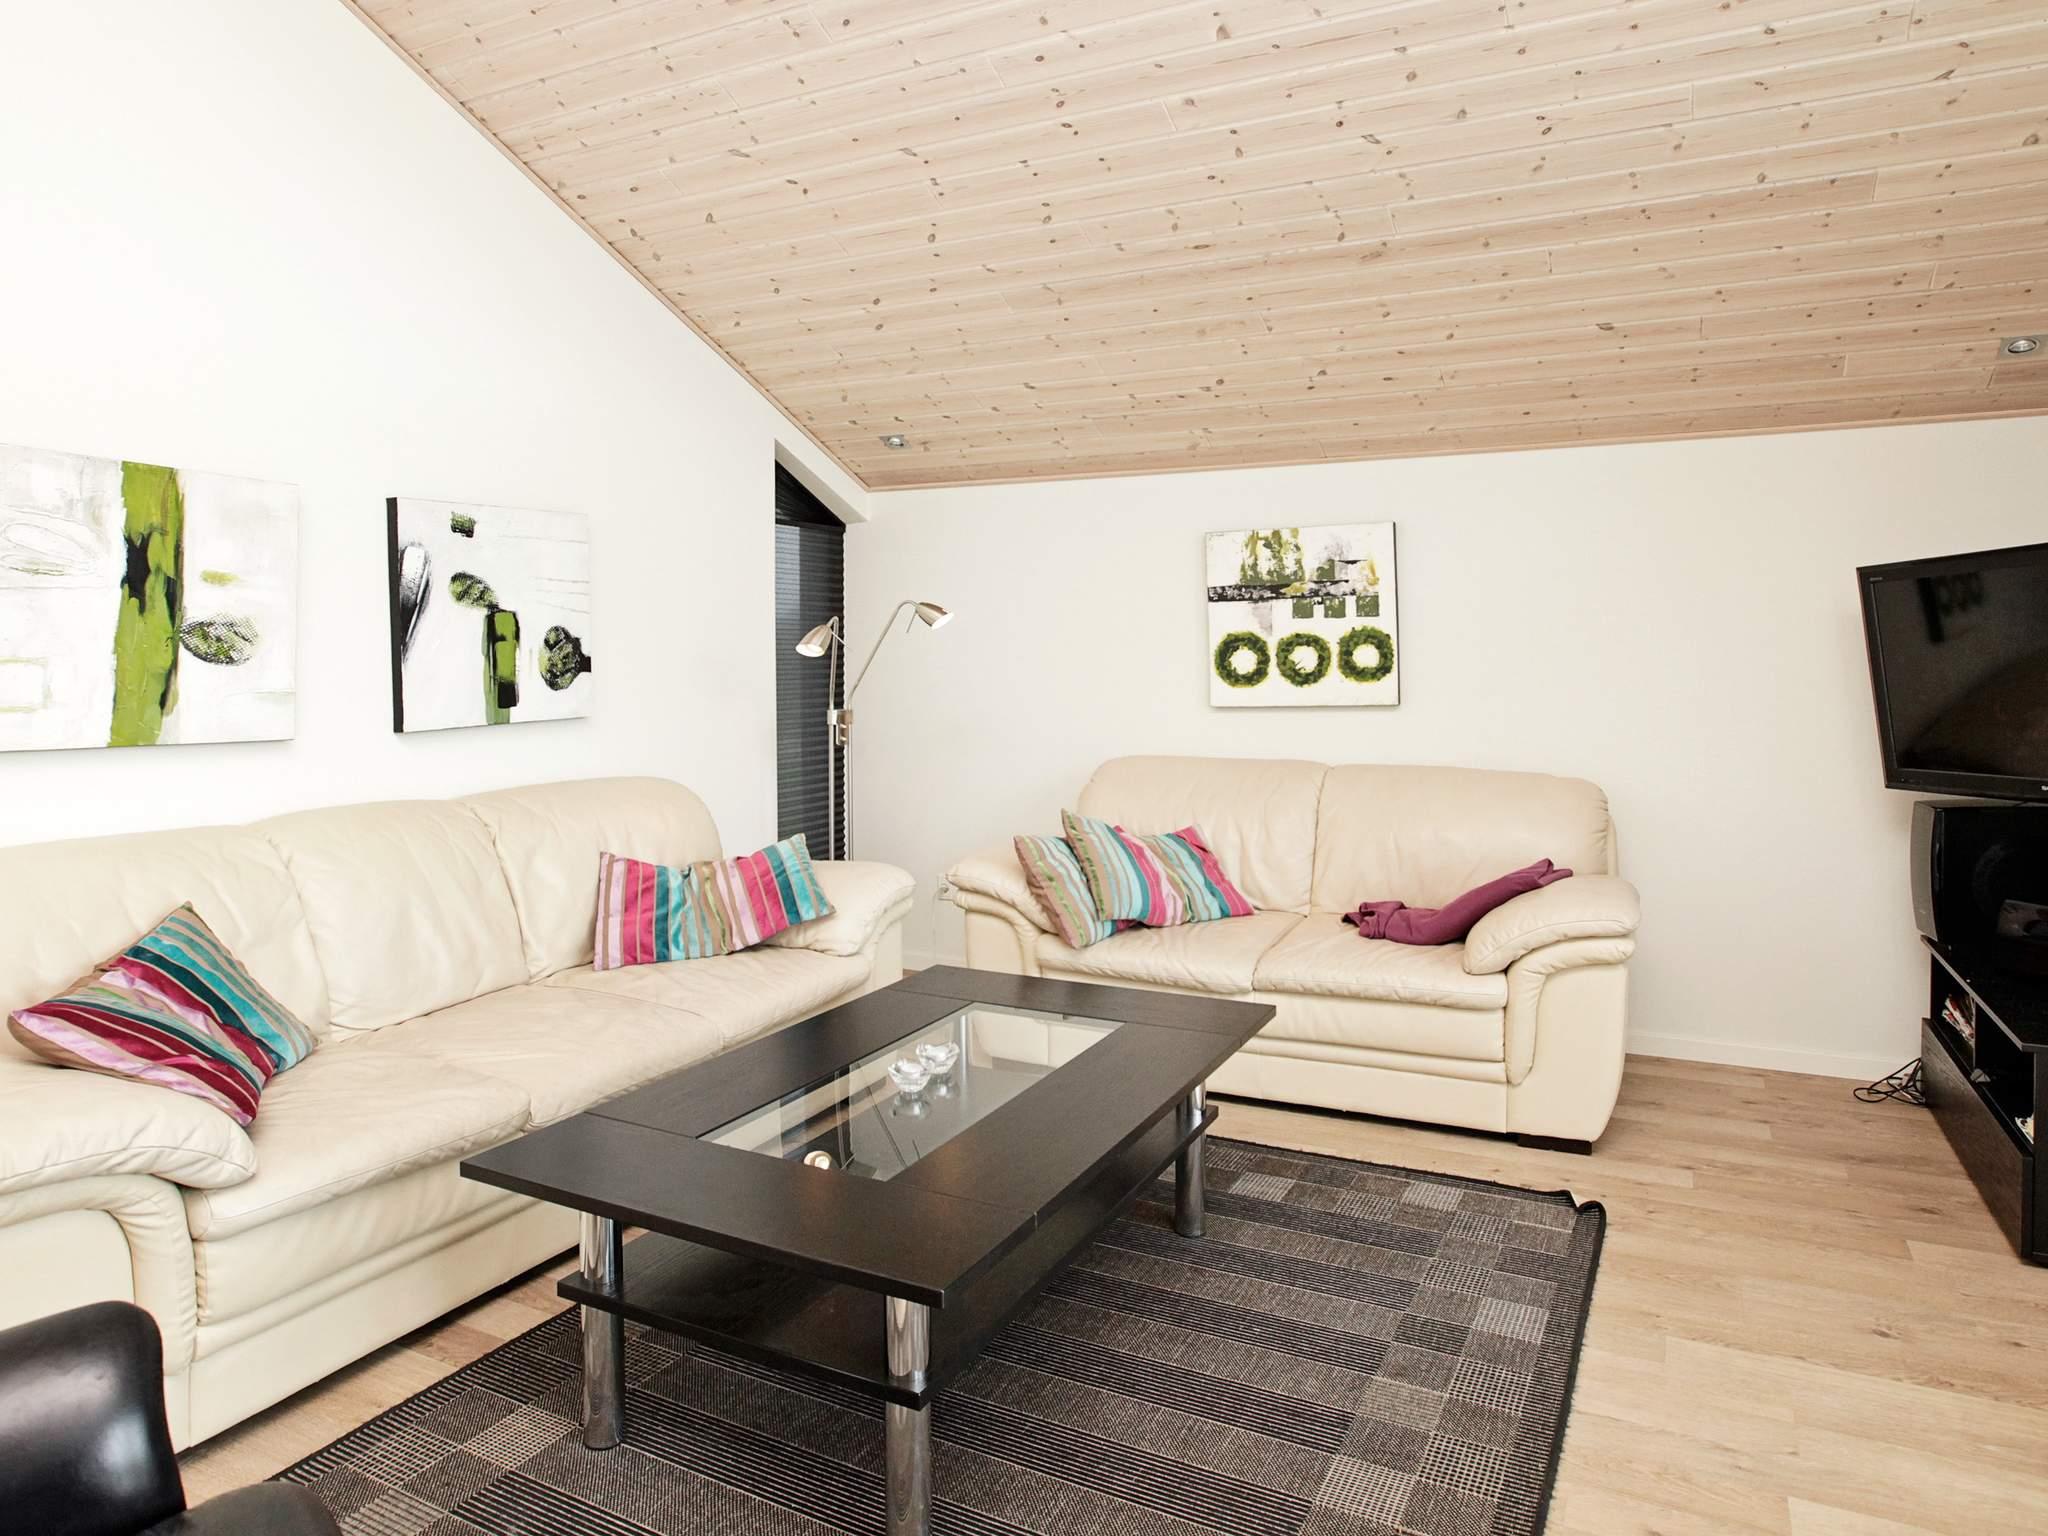 Ferienhaus Tranum Strand (379541), Tranum Enge, , Nordwestjütland, Dänemark, Bild 2